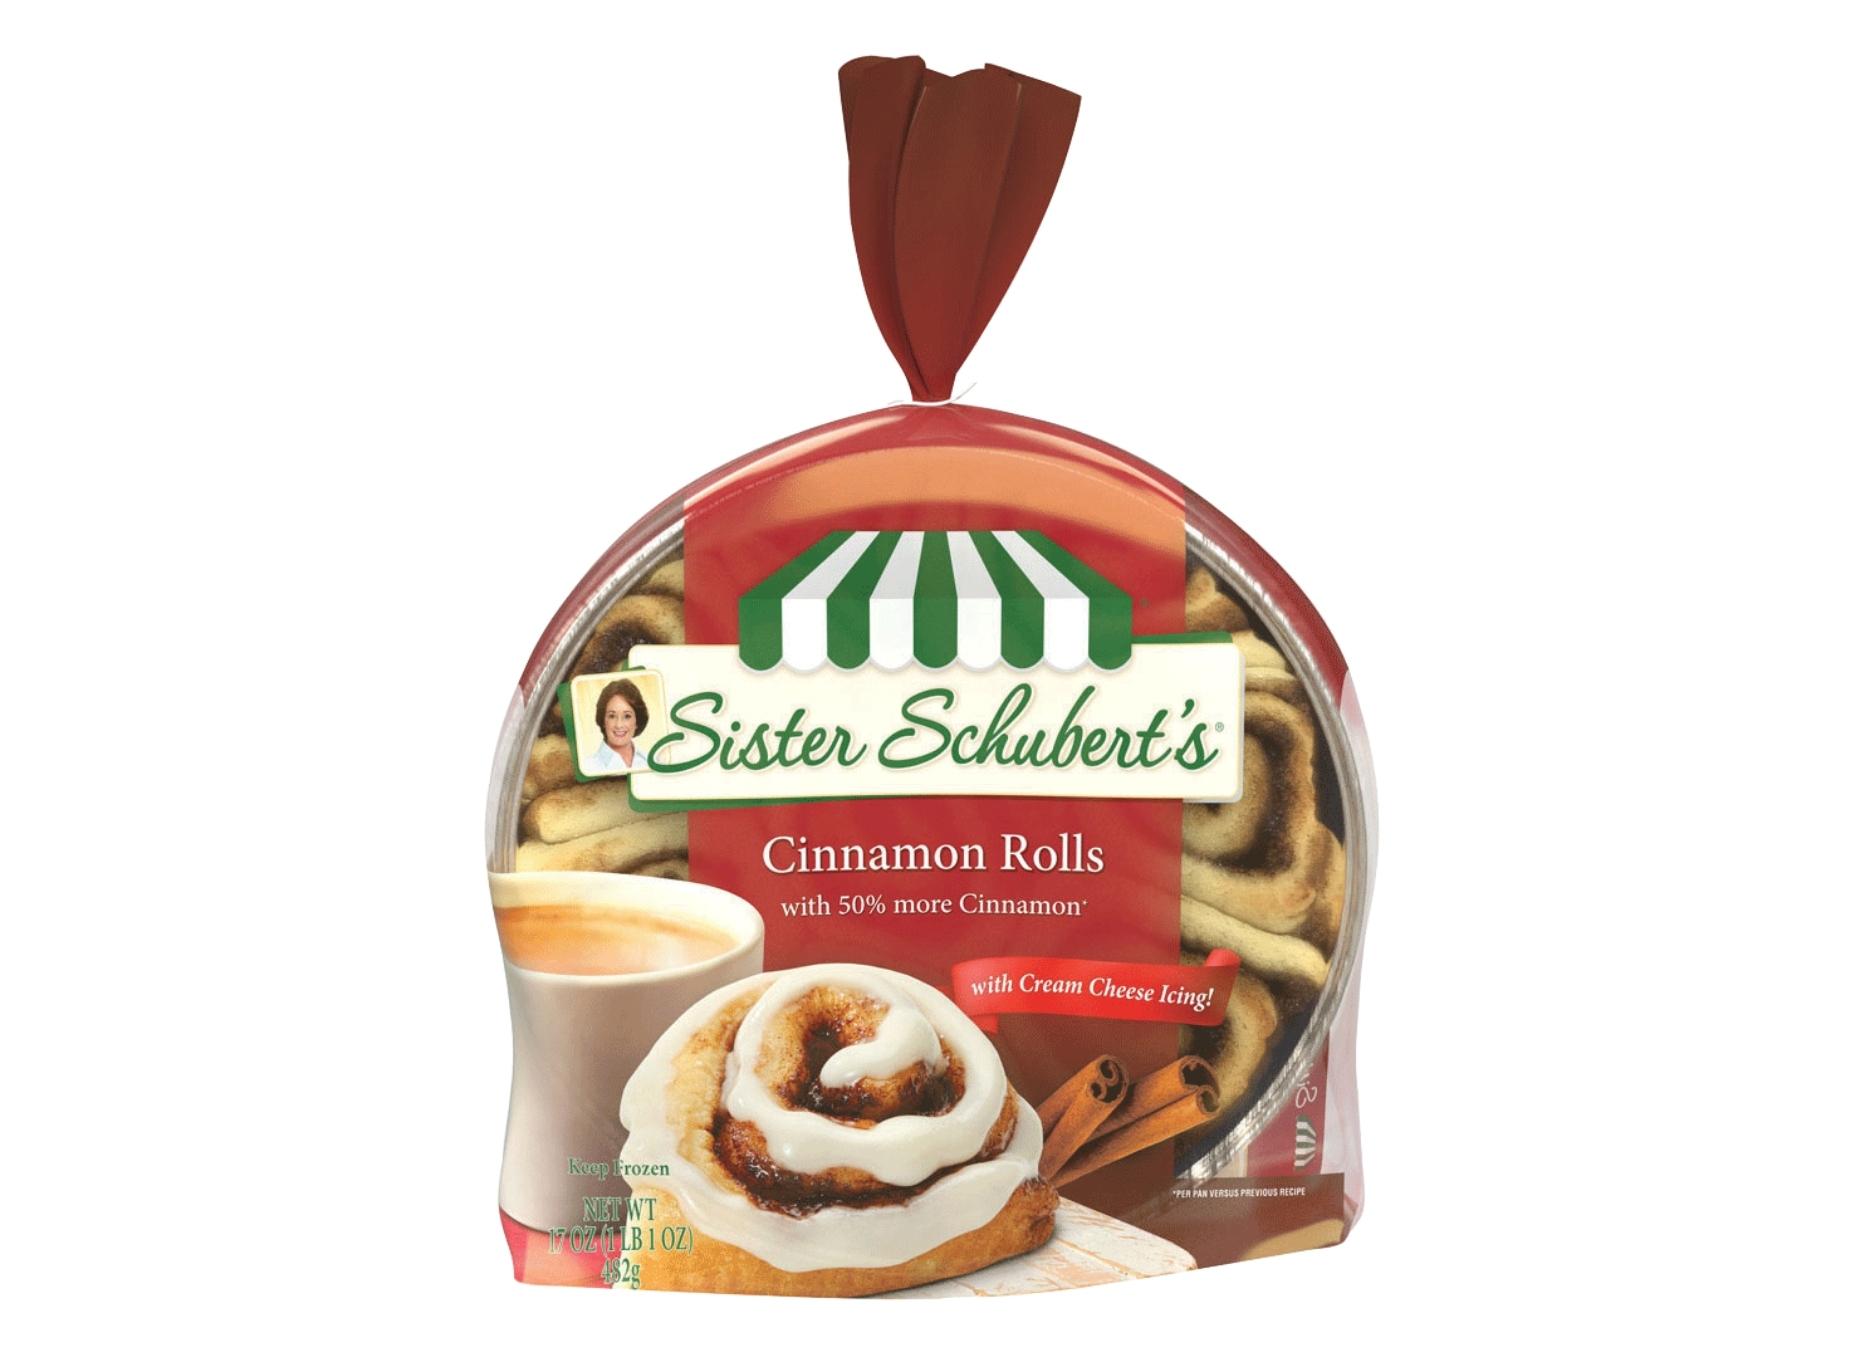 Sister Schubert's Cinnamon Rolls